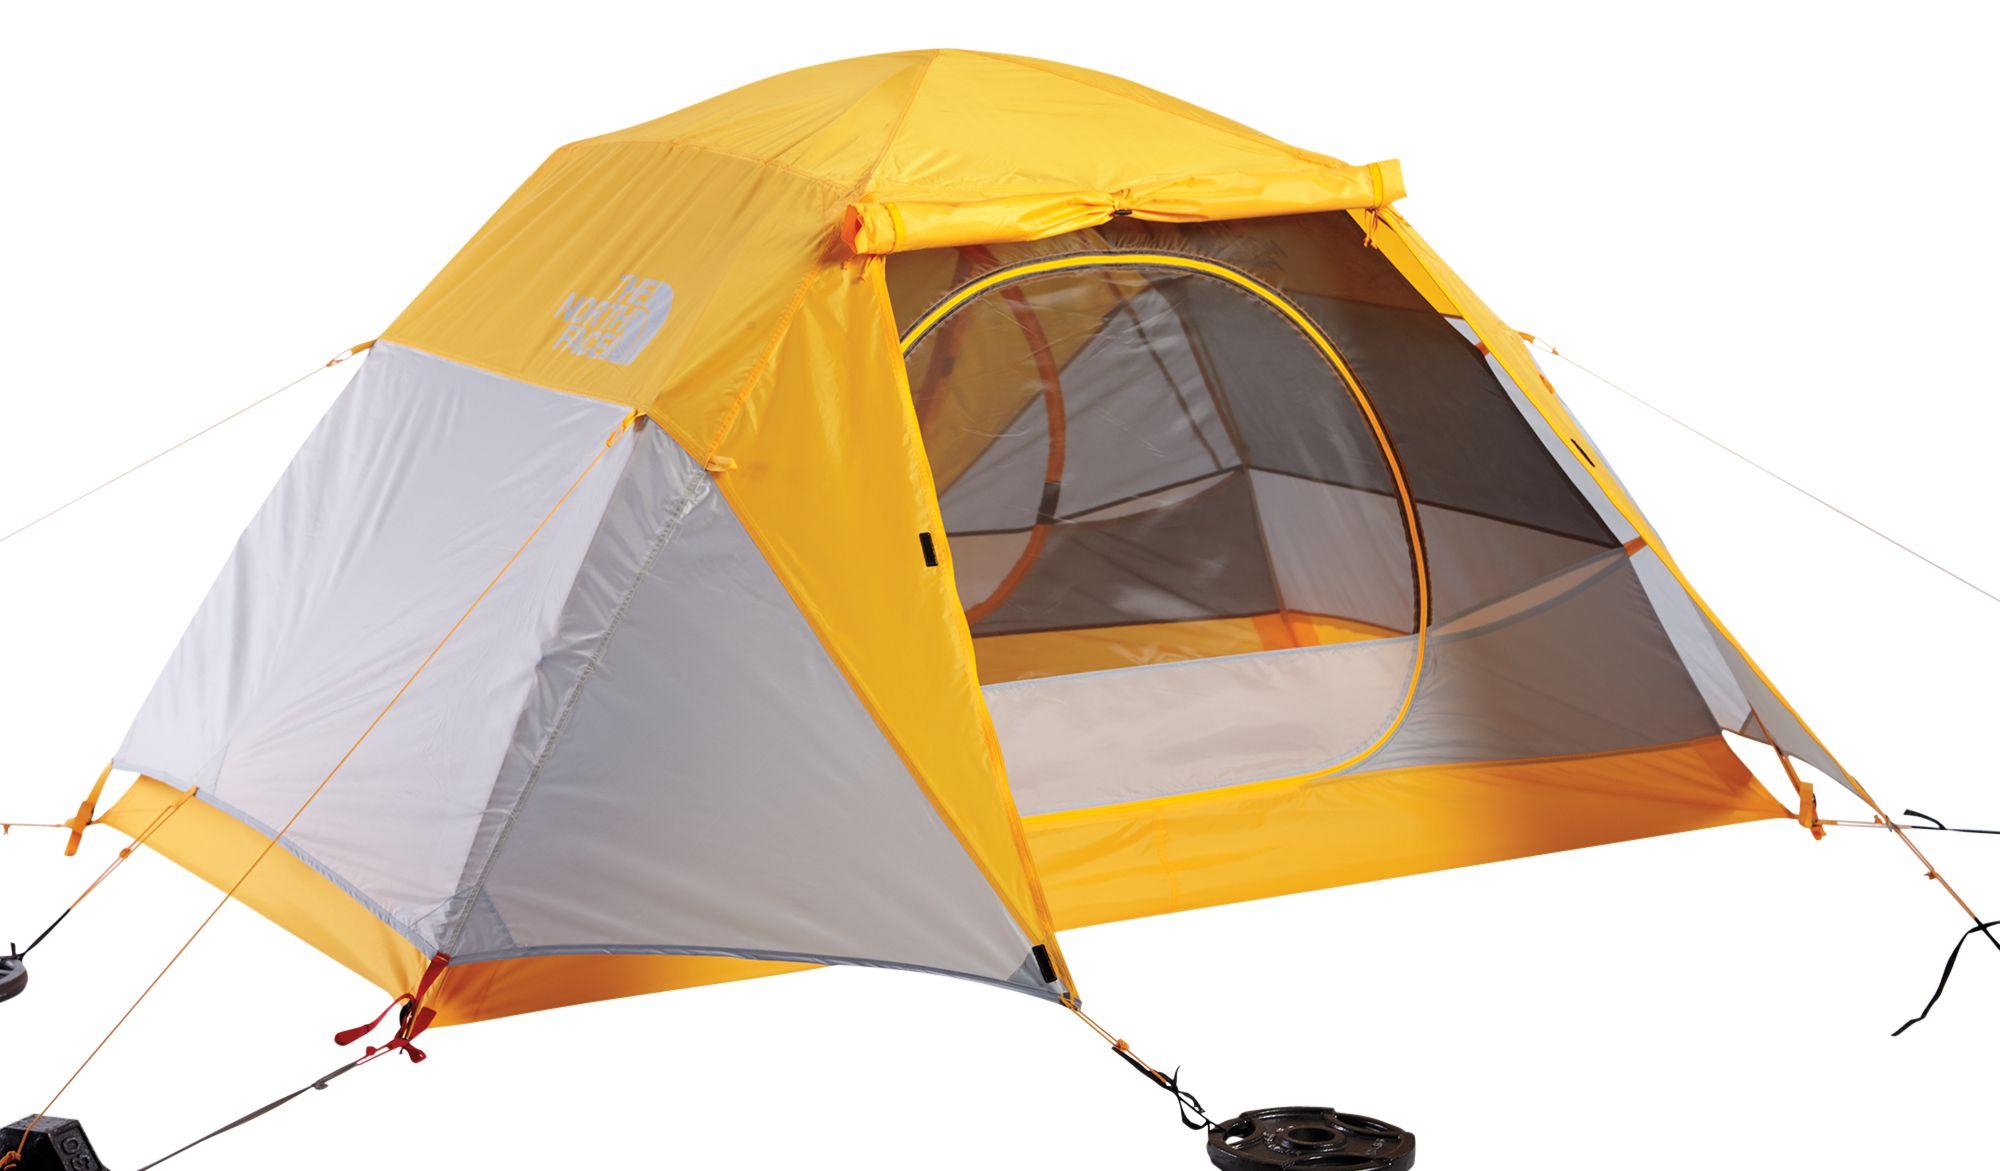 North Face Sequoia 2 Person Tent 1  sc 1 st  Field u0026 Stream & North Face Sequoia 2 Person Tent | Field u0026 Stream